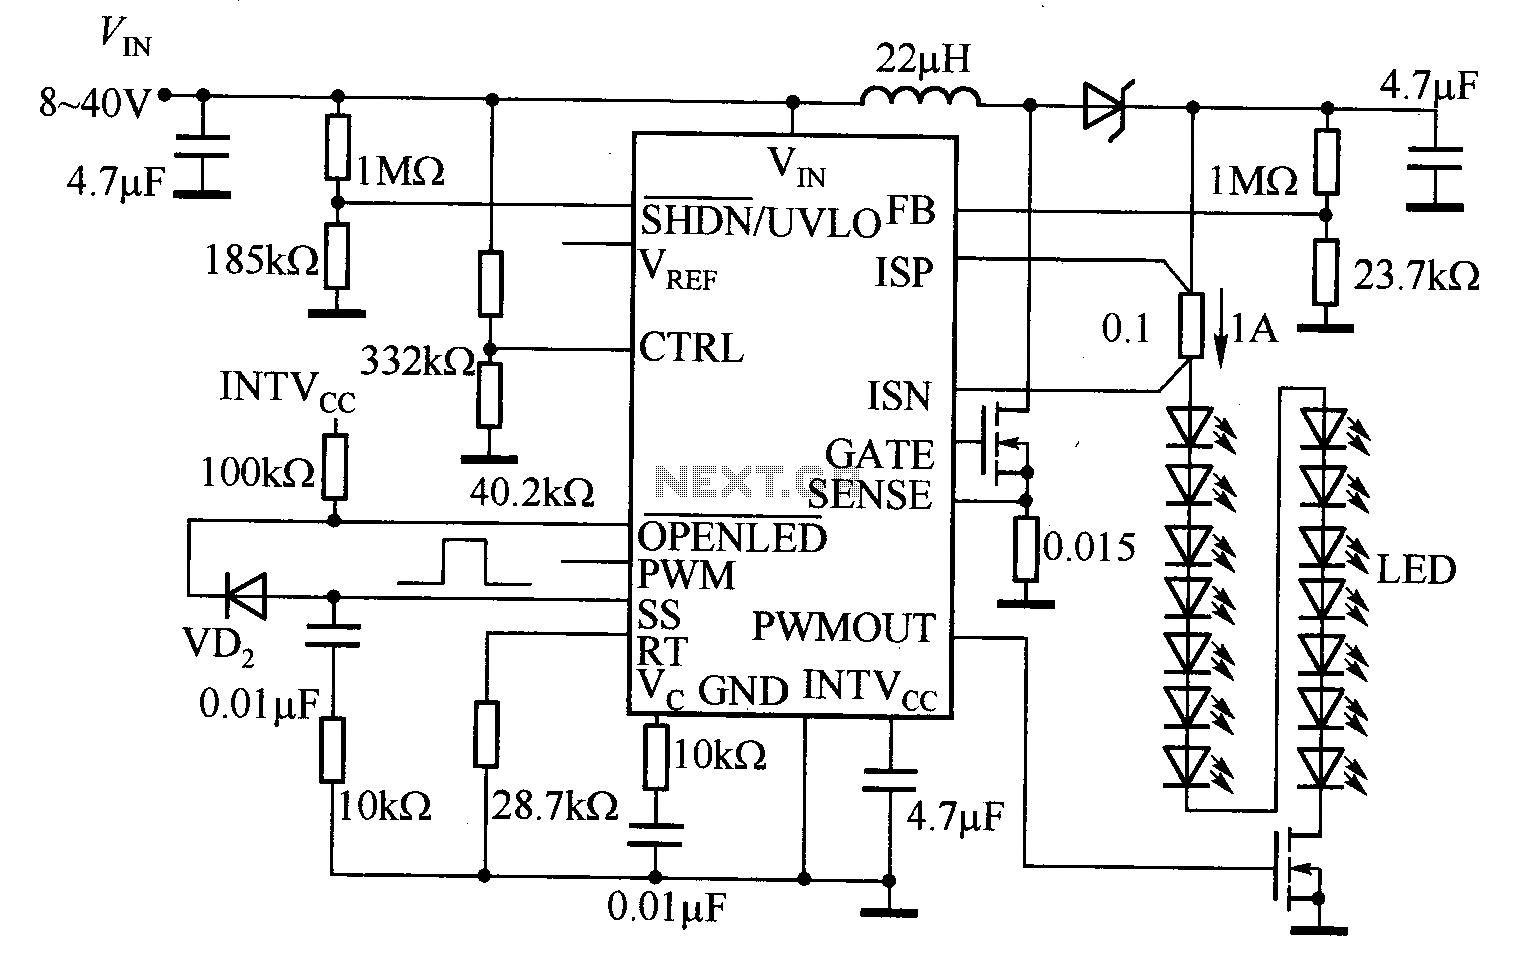 hight resolution of 50w white led automotive headlamp drivercircuit diagram world led circuit page 2 light laser led circuits